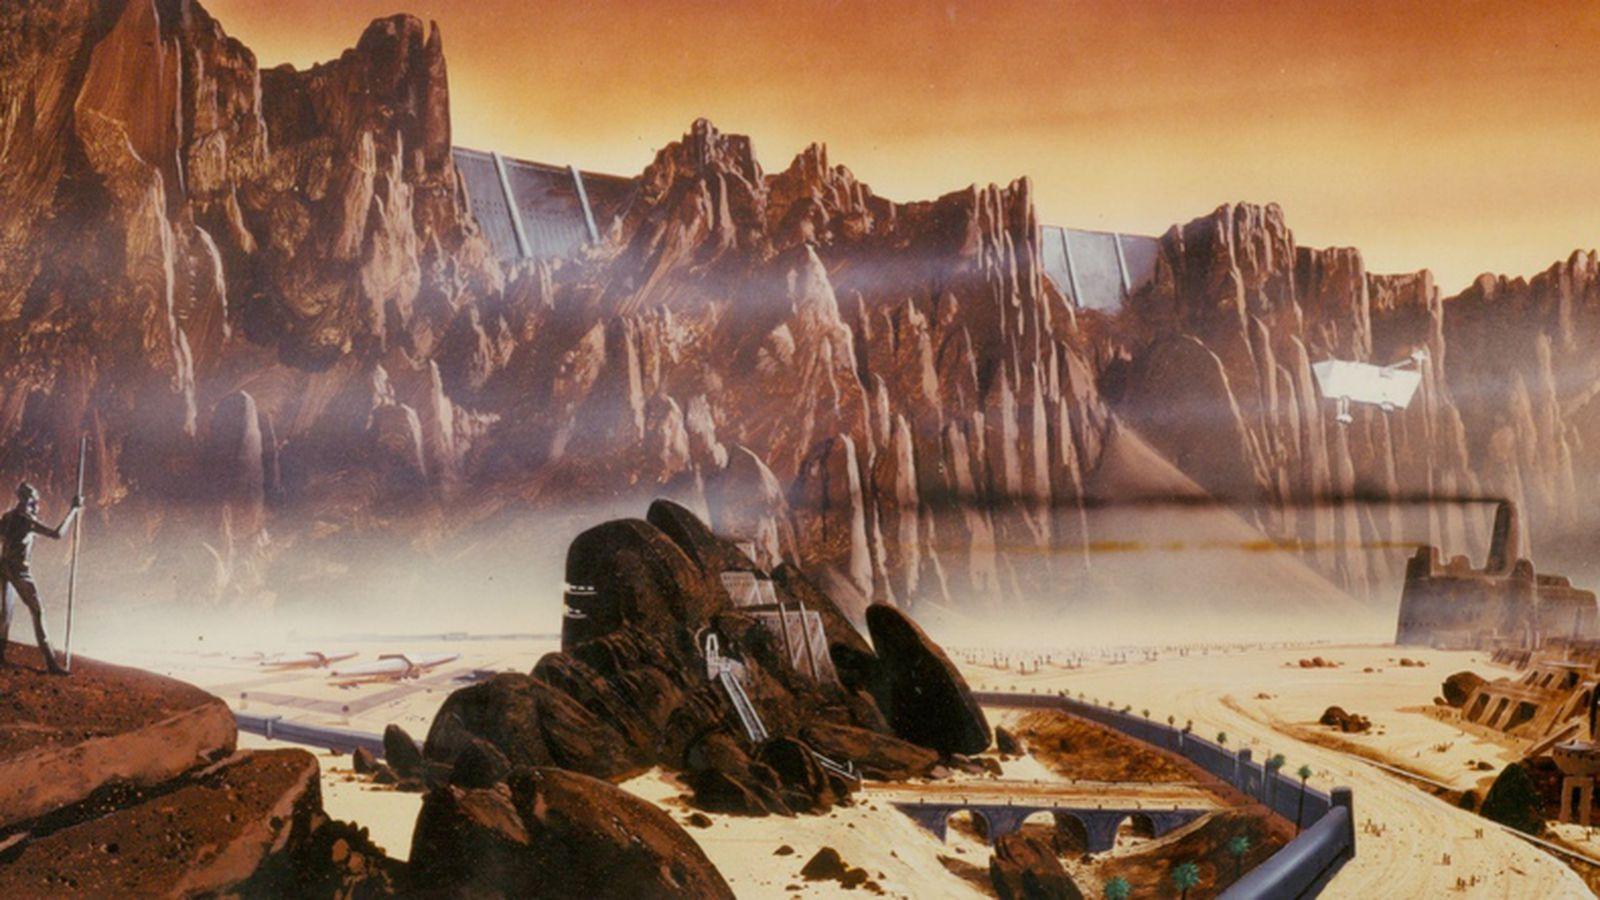 Dune Arte